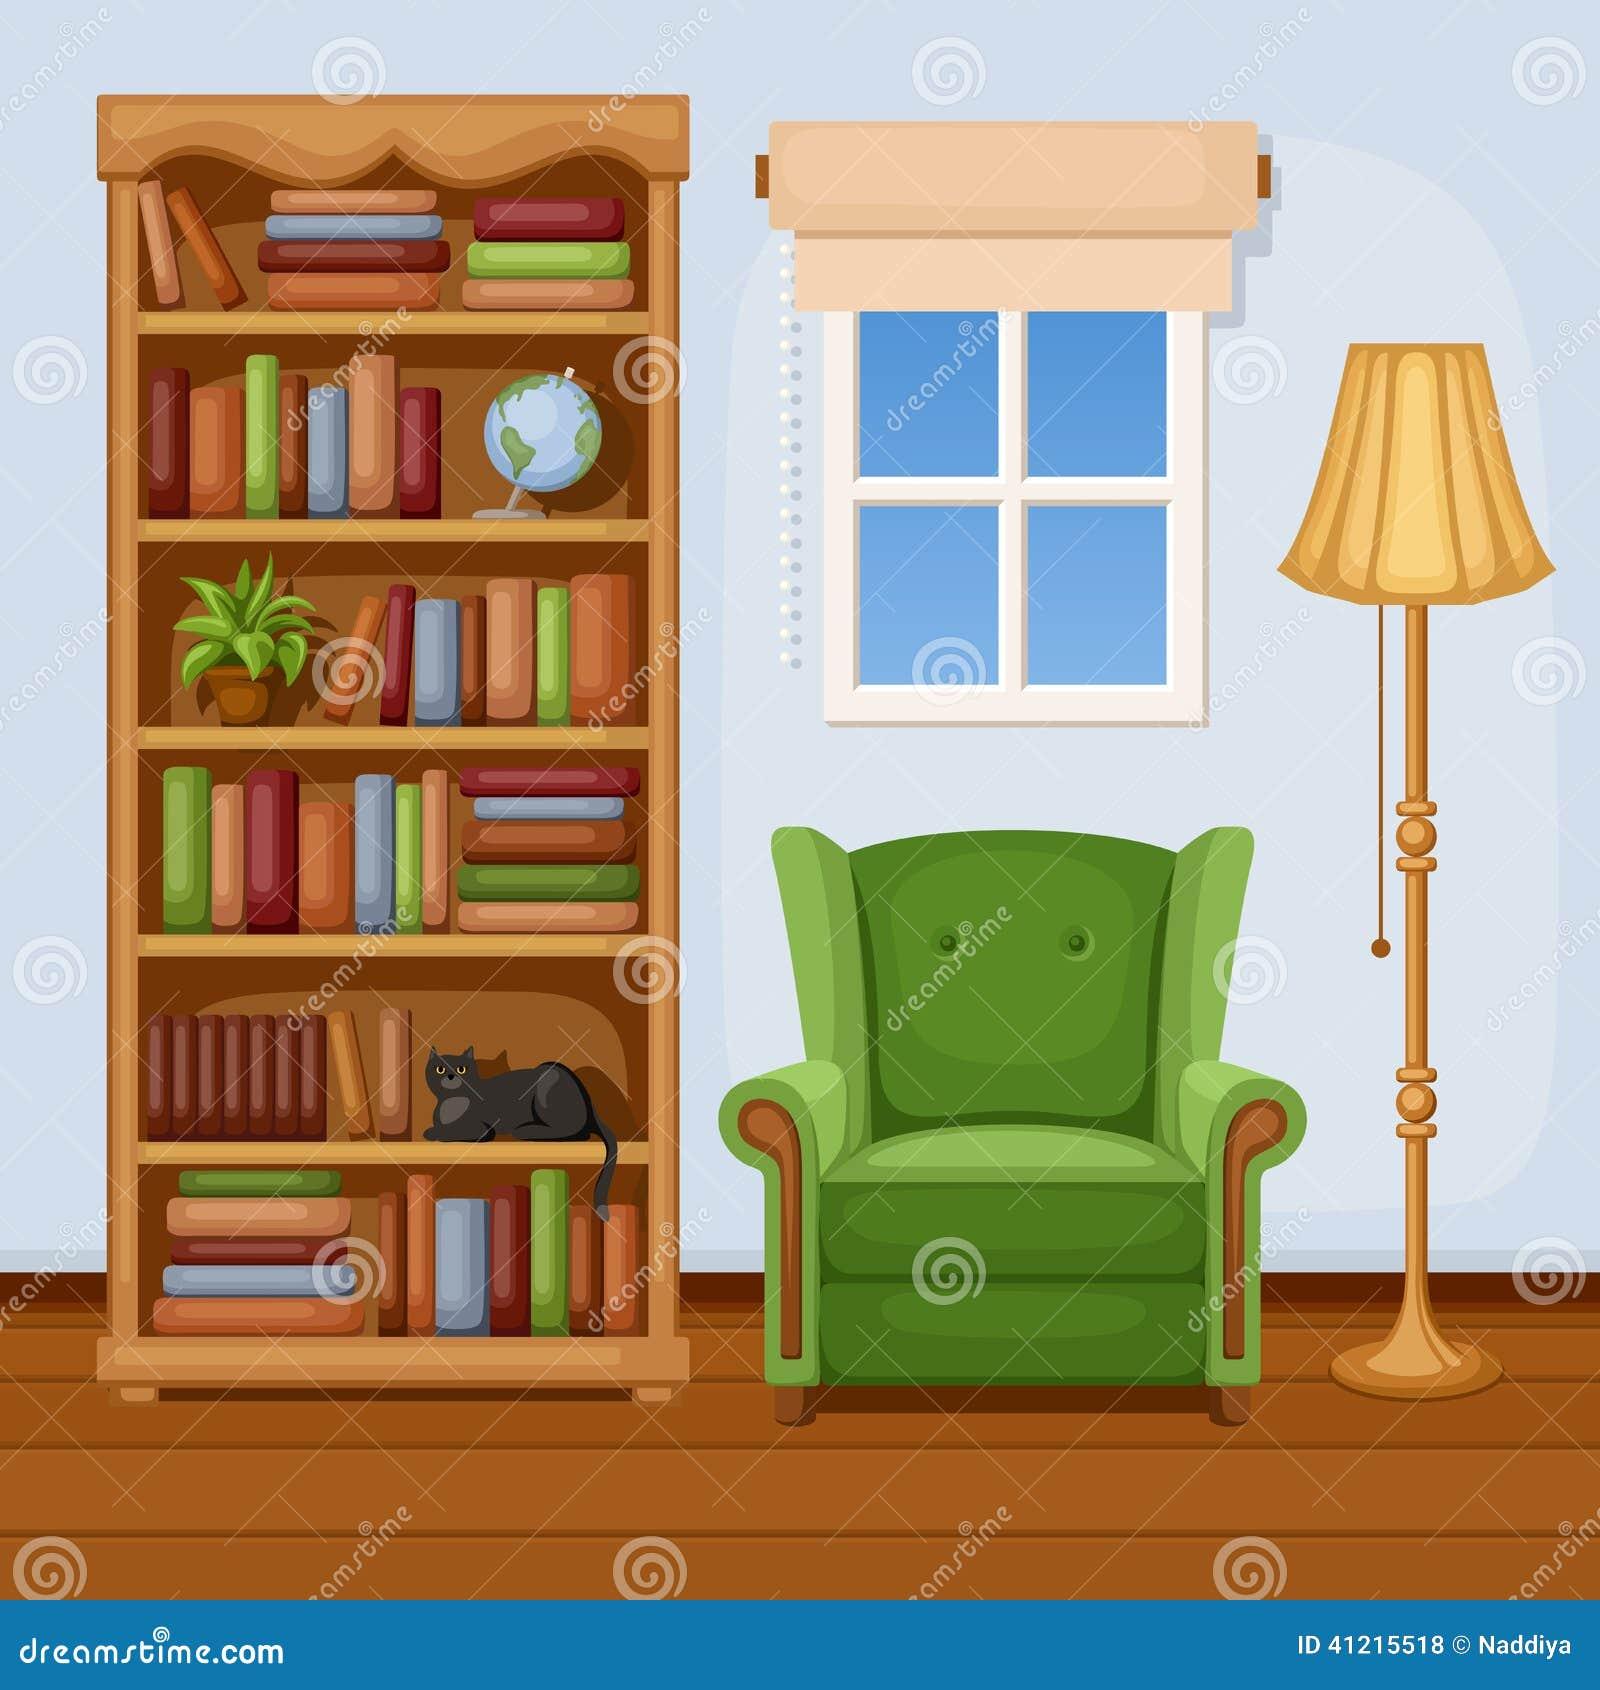 House interior living room фотографии, картинки, изображения.